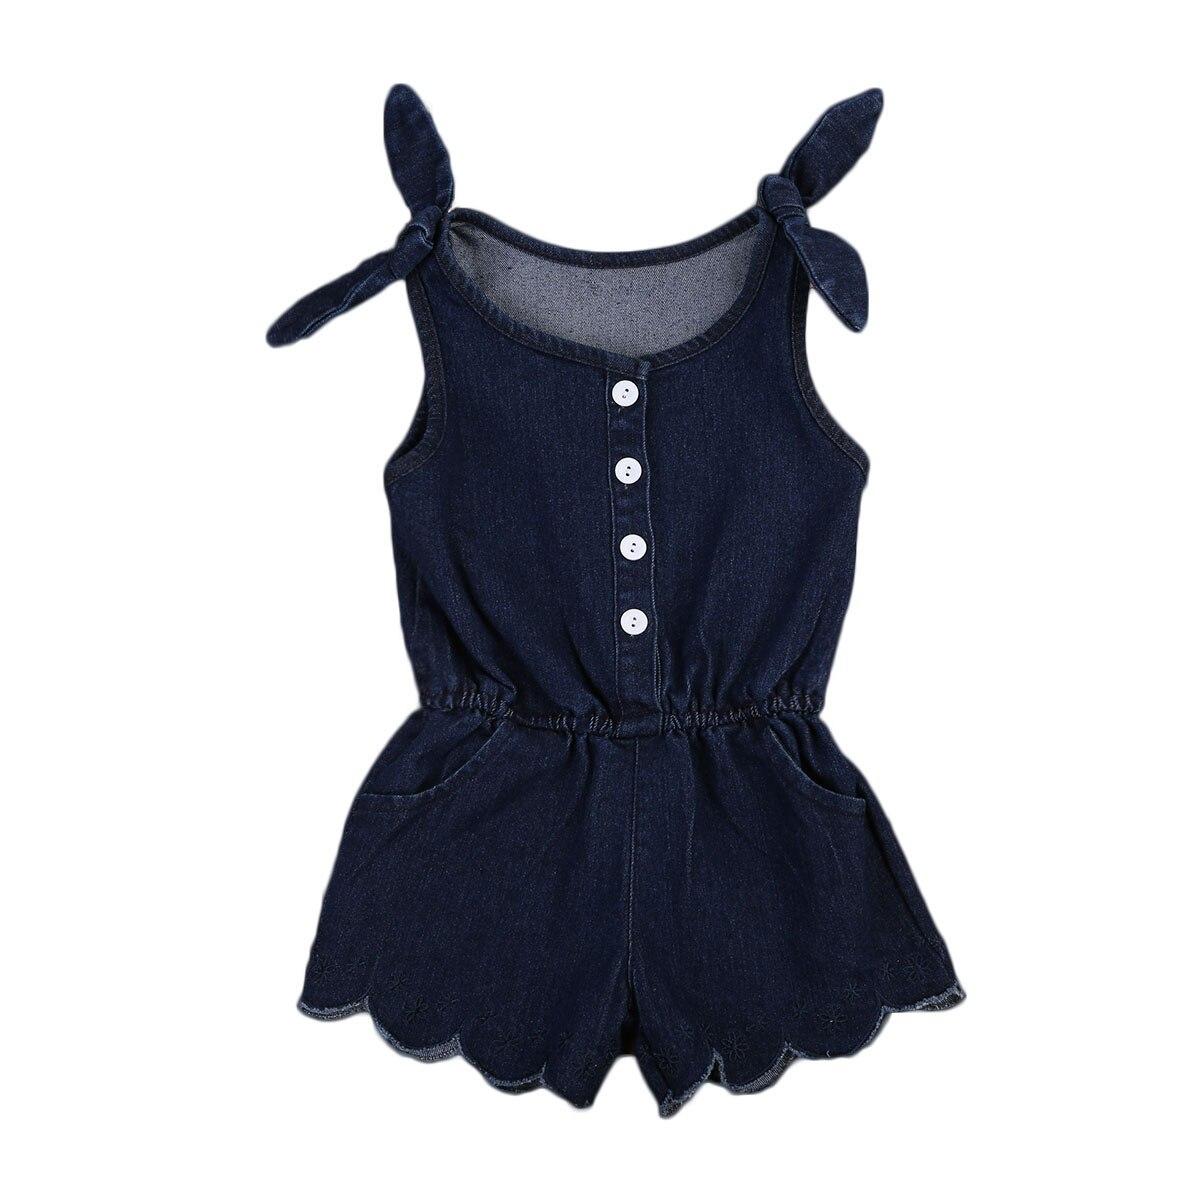 Baby Clothing Newborn Toddler Kids Baby Girls denim Romper Button Jumpsuit Outfits Denim Sunsuit Clothing